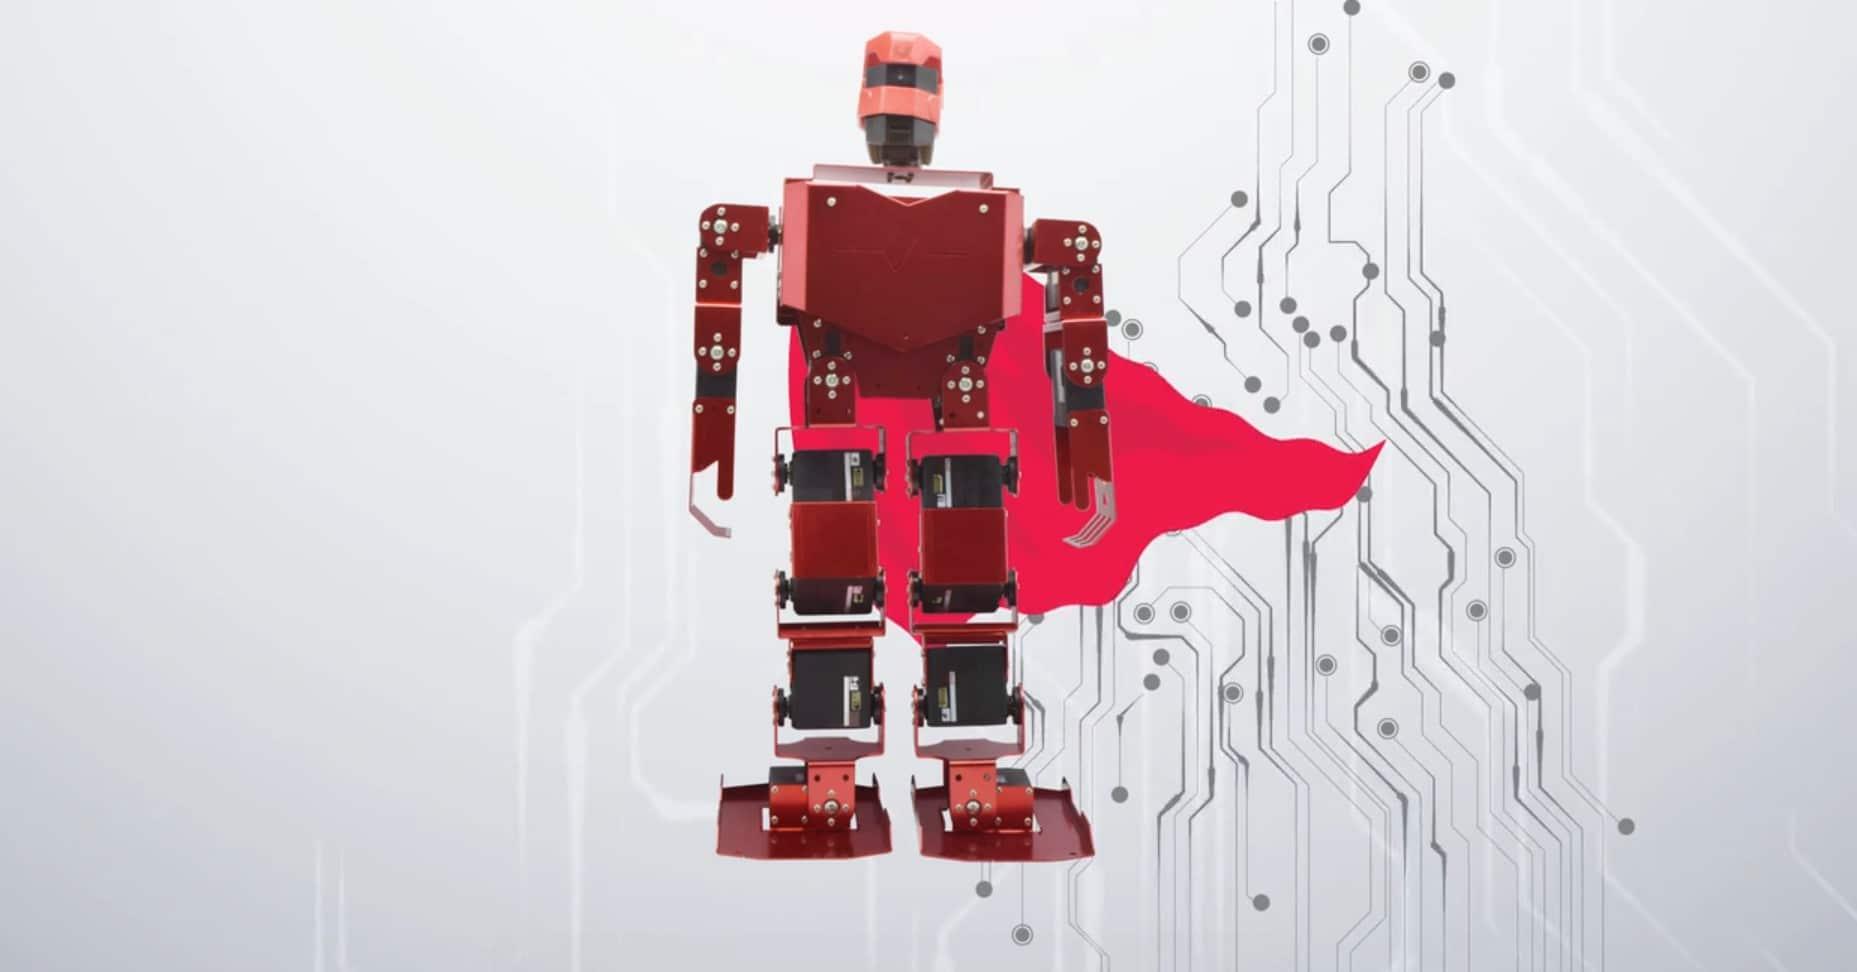 PiMecha: Baut euch einen humanoiden Roboter